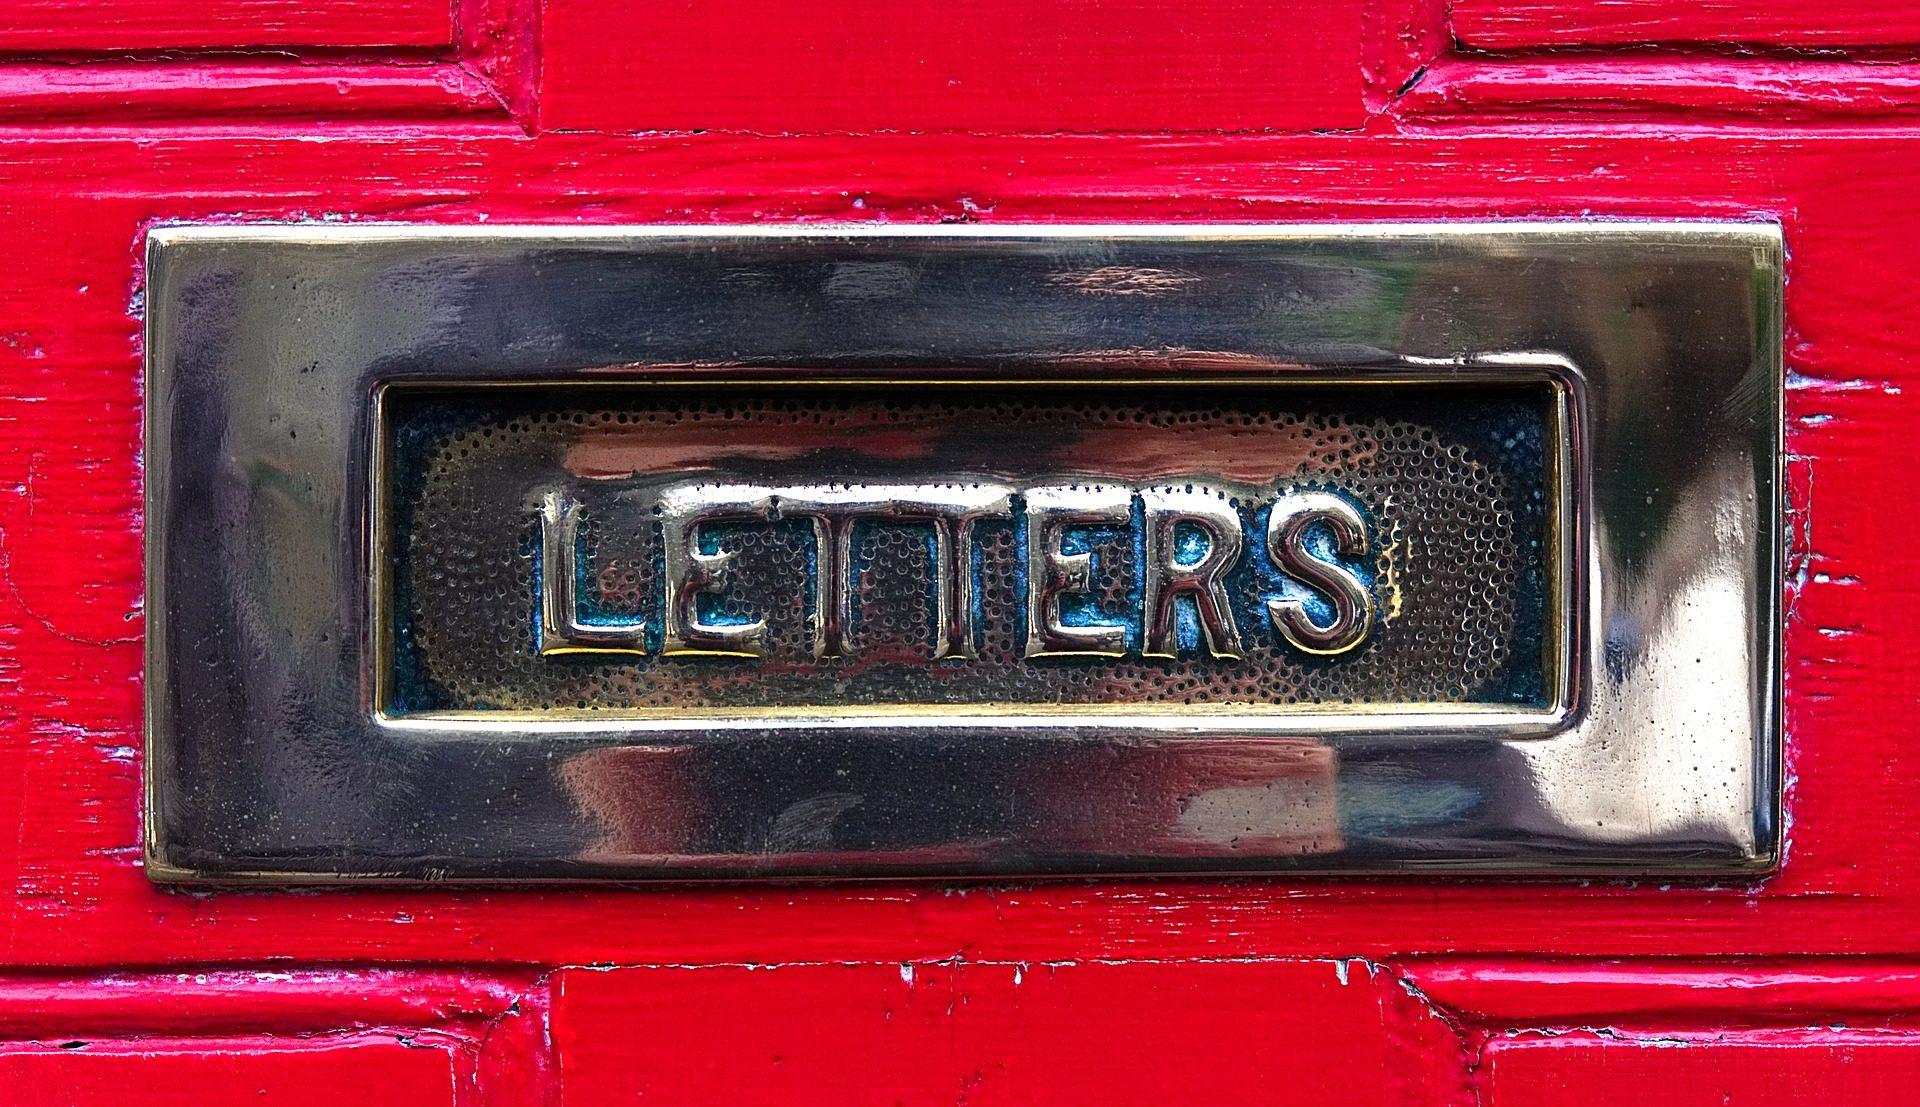 मेलबॉक्स, दरवाजा, लकड़ी, पत्र, गीत, metálico - HD वॉलपेपर - प्रोफेसर-falken.com